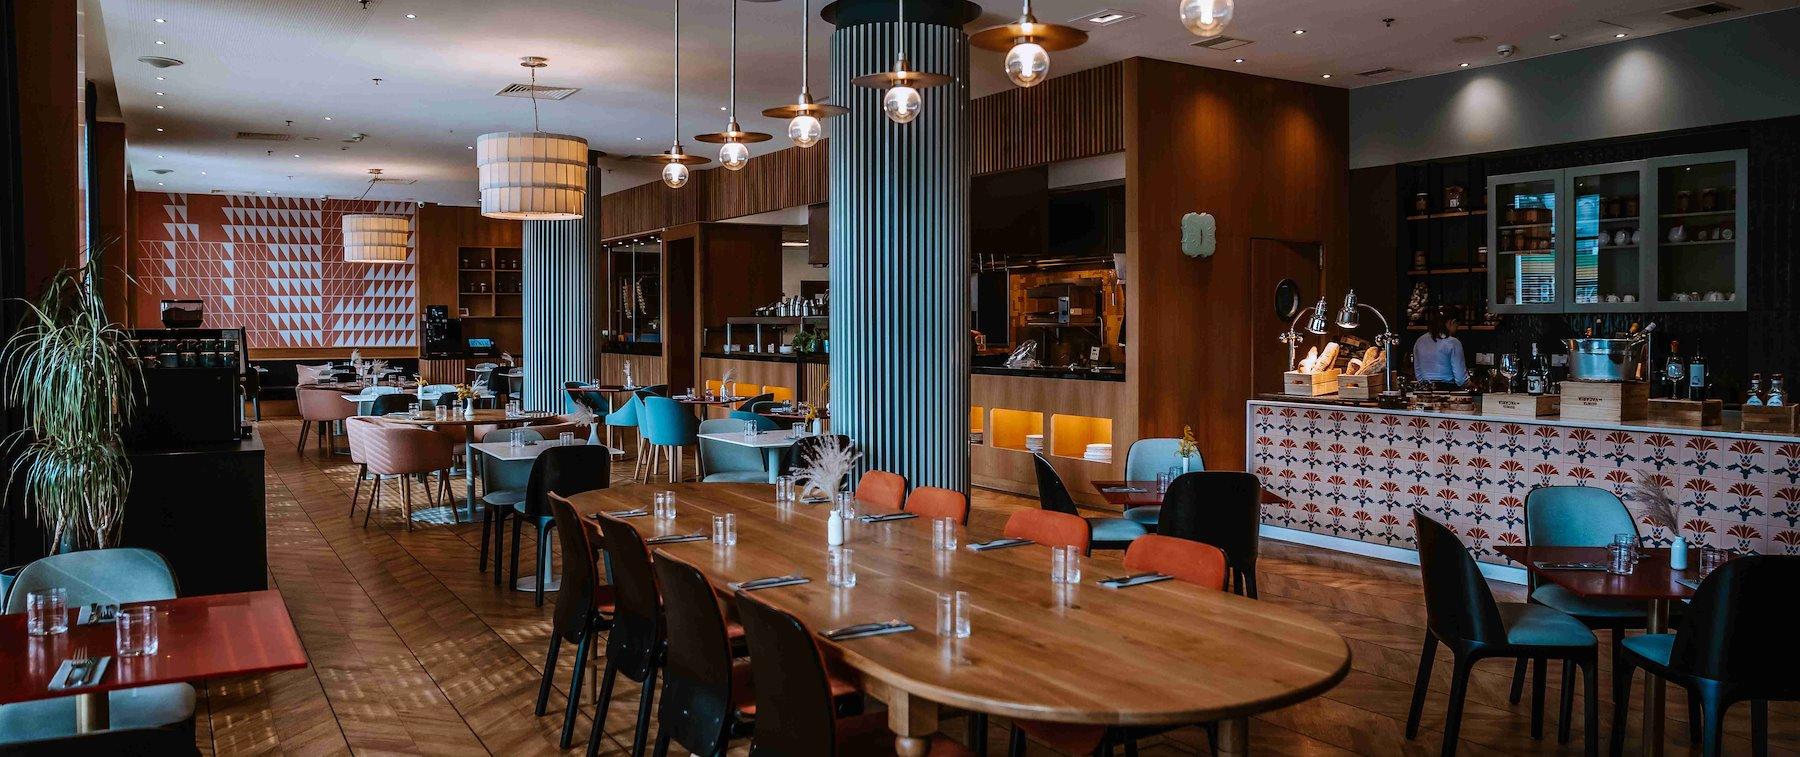 Restaurant Rynek Poznan